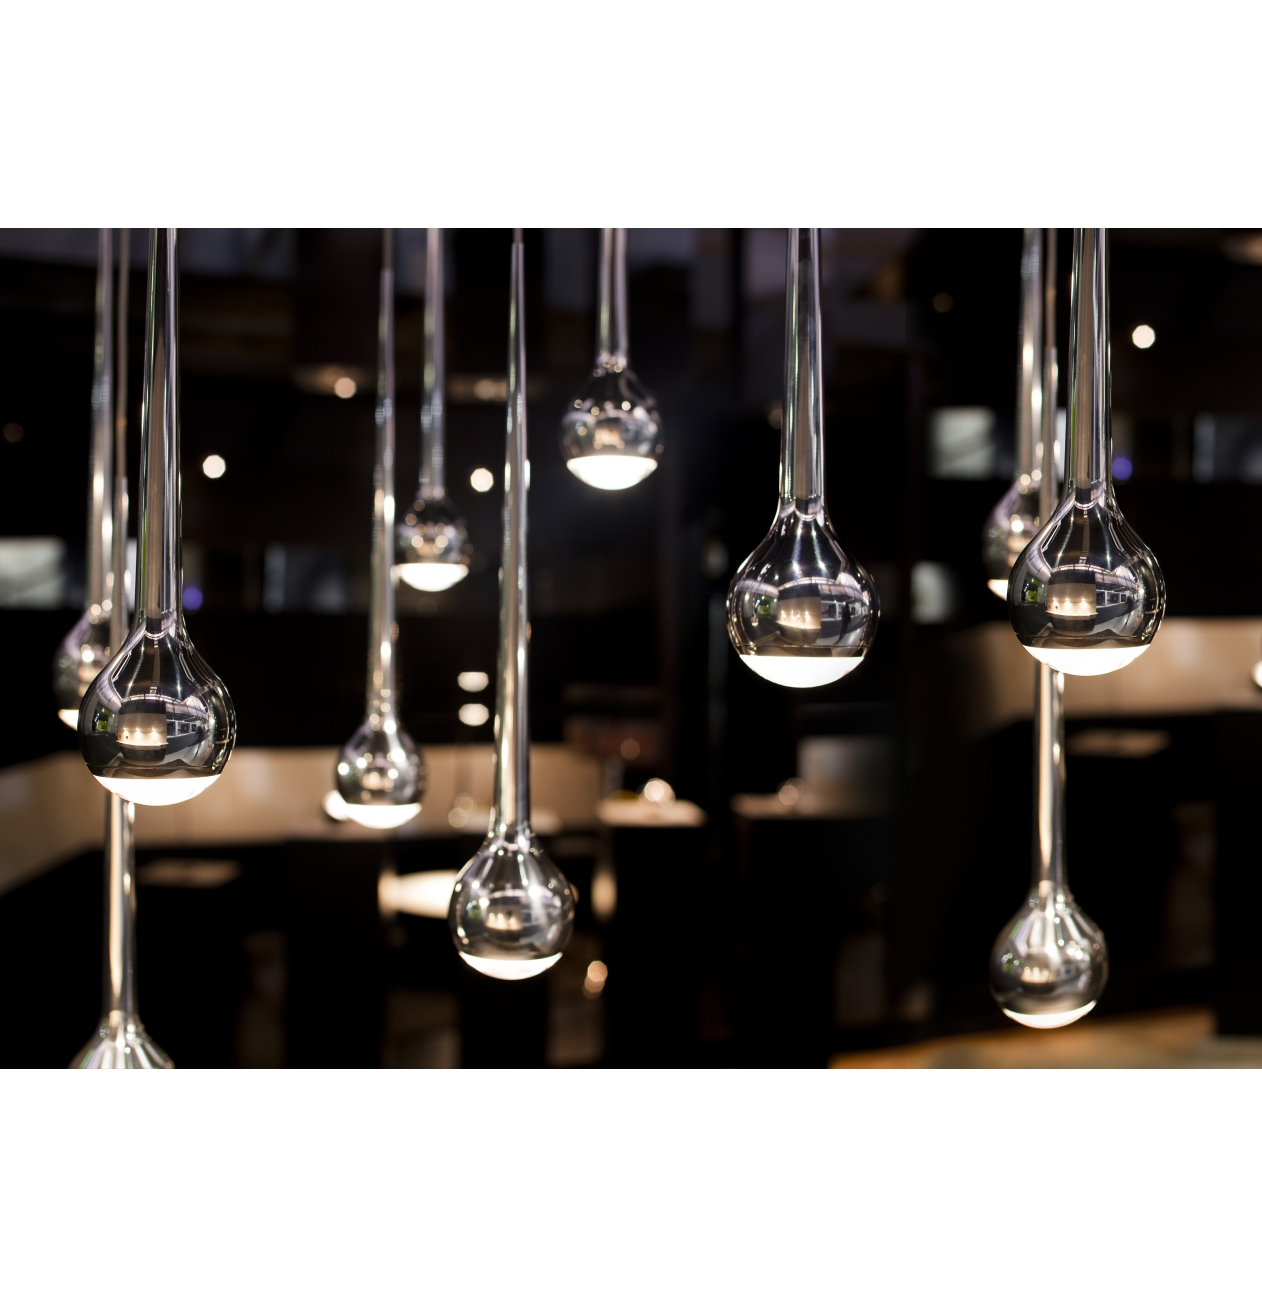 tobias grau hanglamp falling water 6 versteeg lichtstudio. Black Bedroom Furniture Sets. Home Design Ideas